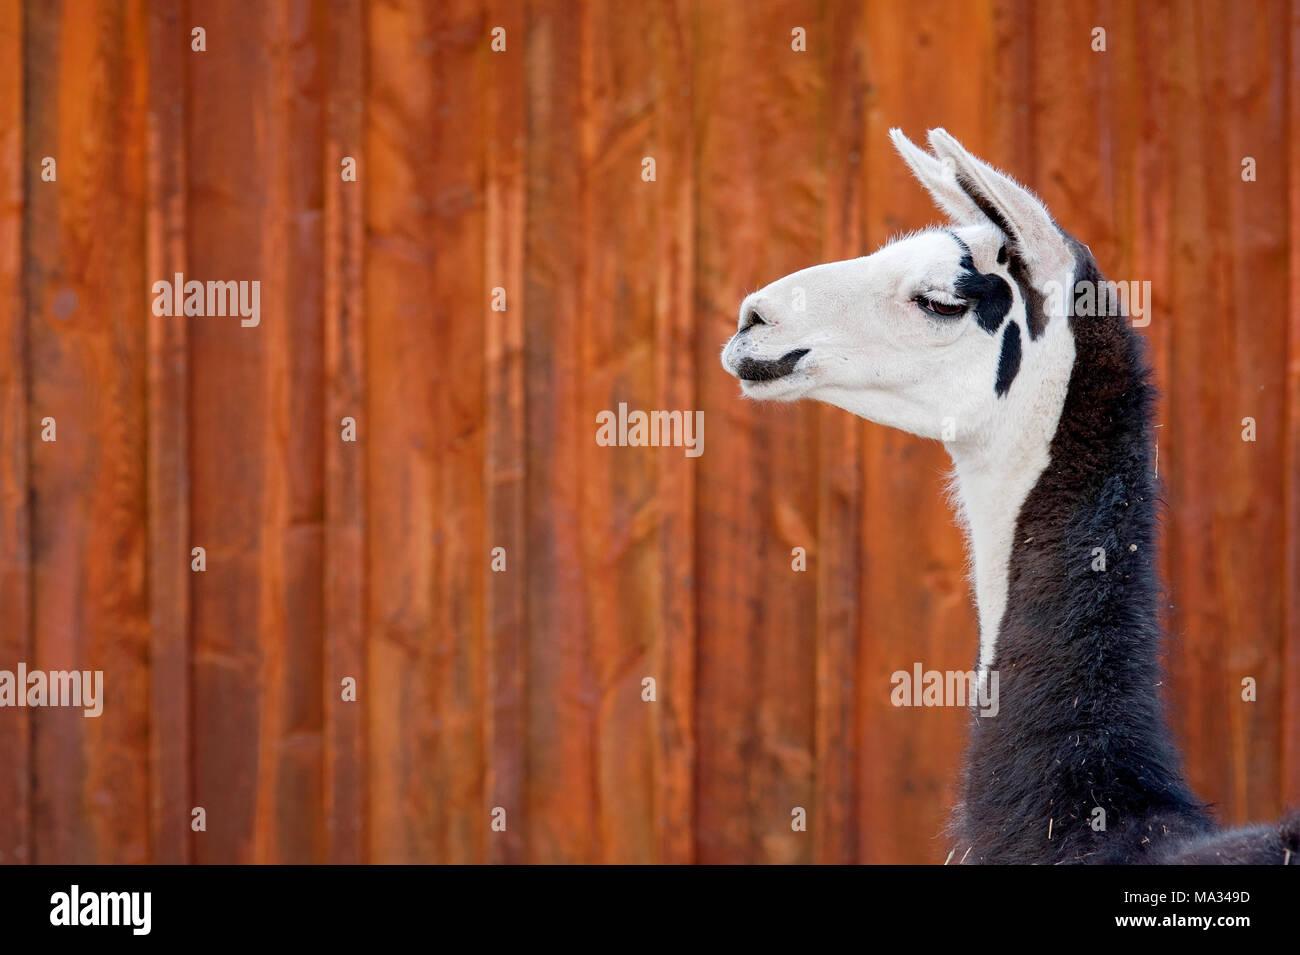 A headshot of a black and white Llama. Shot against orange, rusty, barn siding. - Stock Image